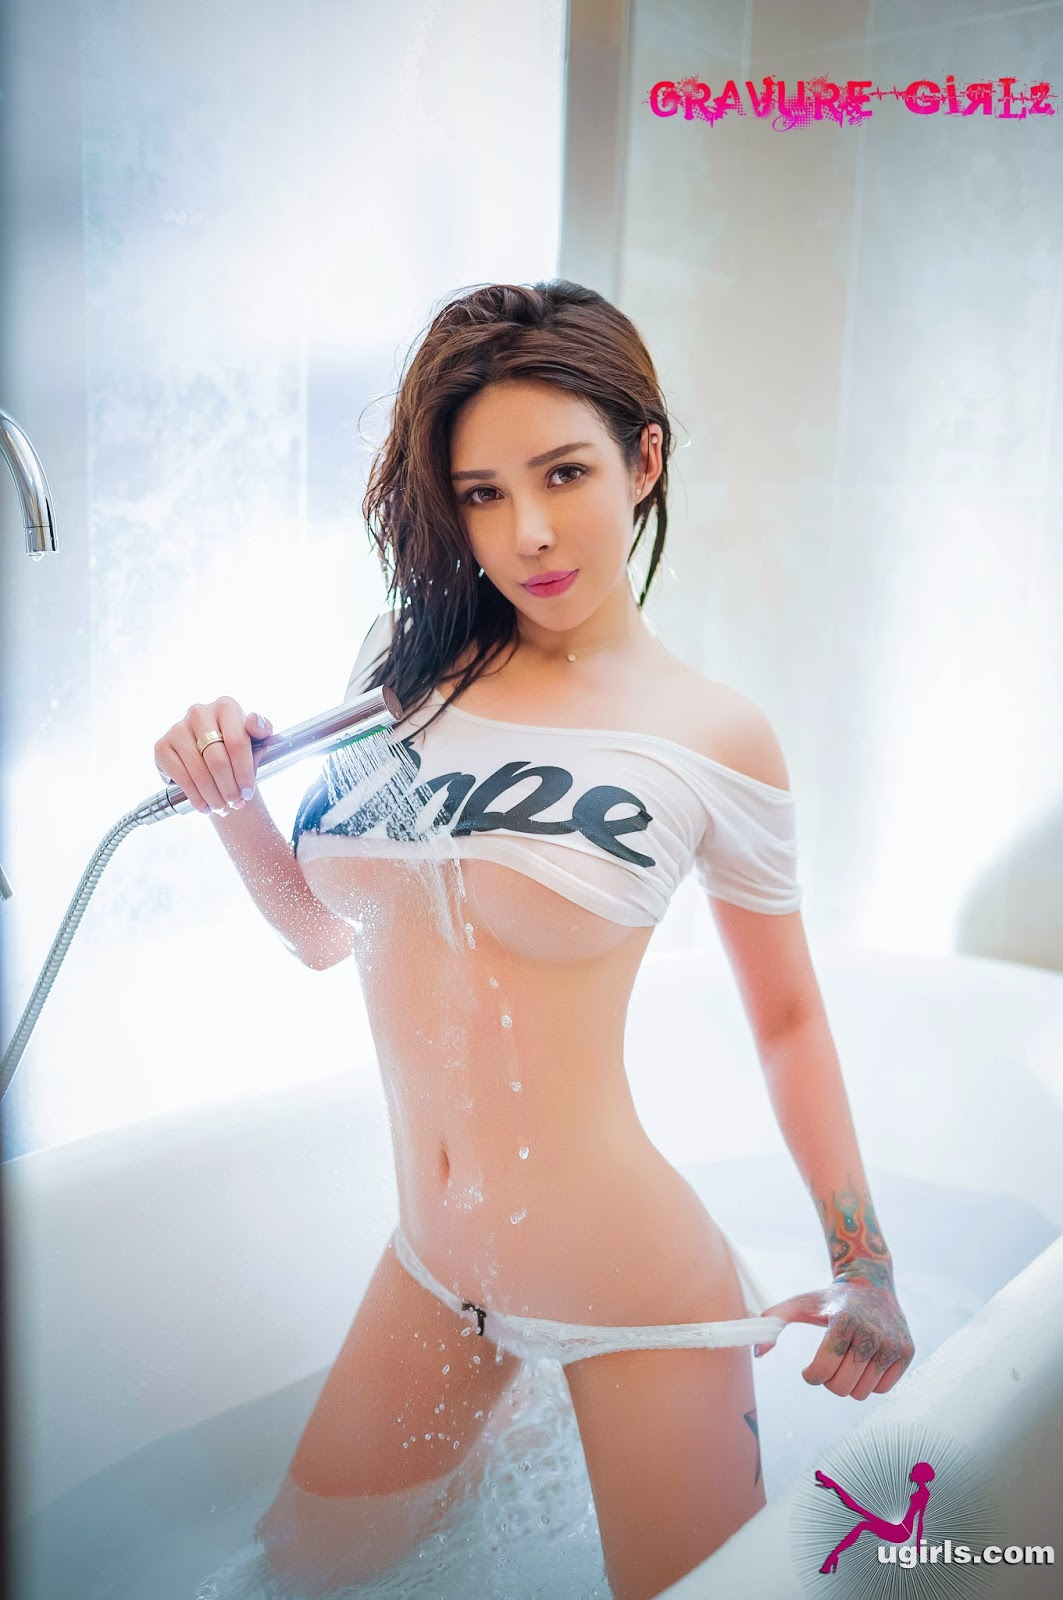 EastBabescom Nude Asian Beauties &